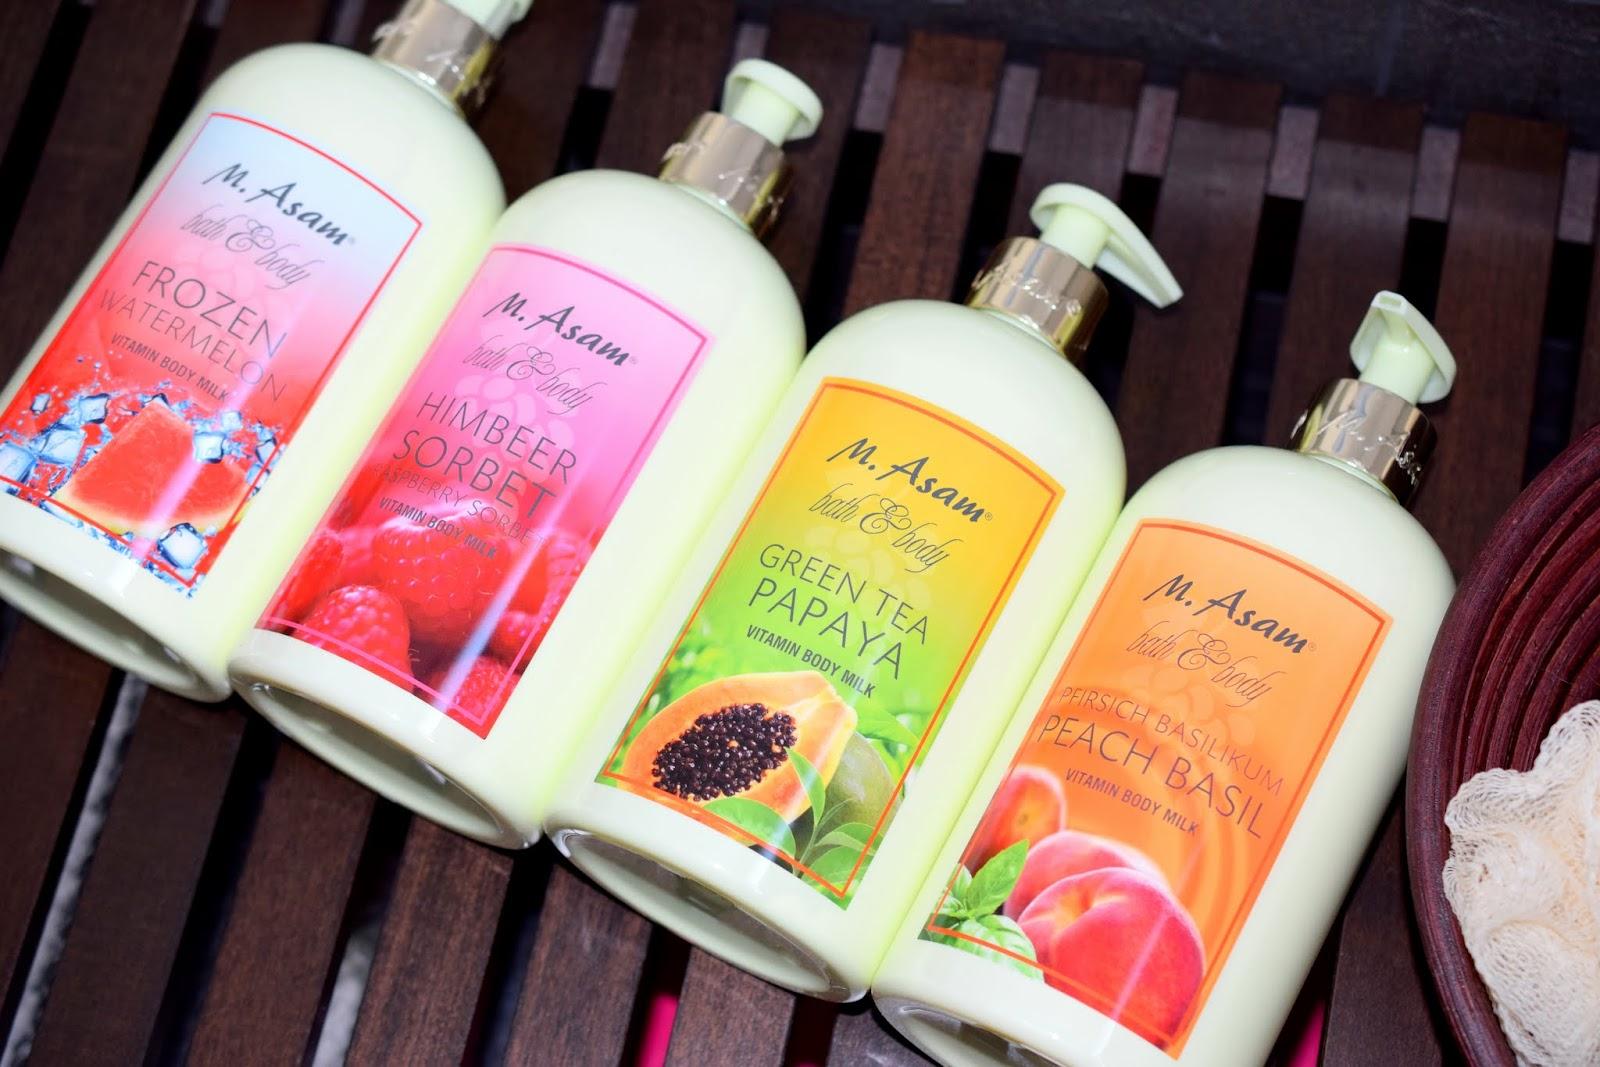 M.Asam Vitamin Body Milk